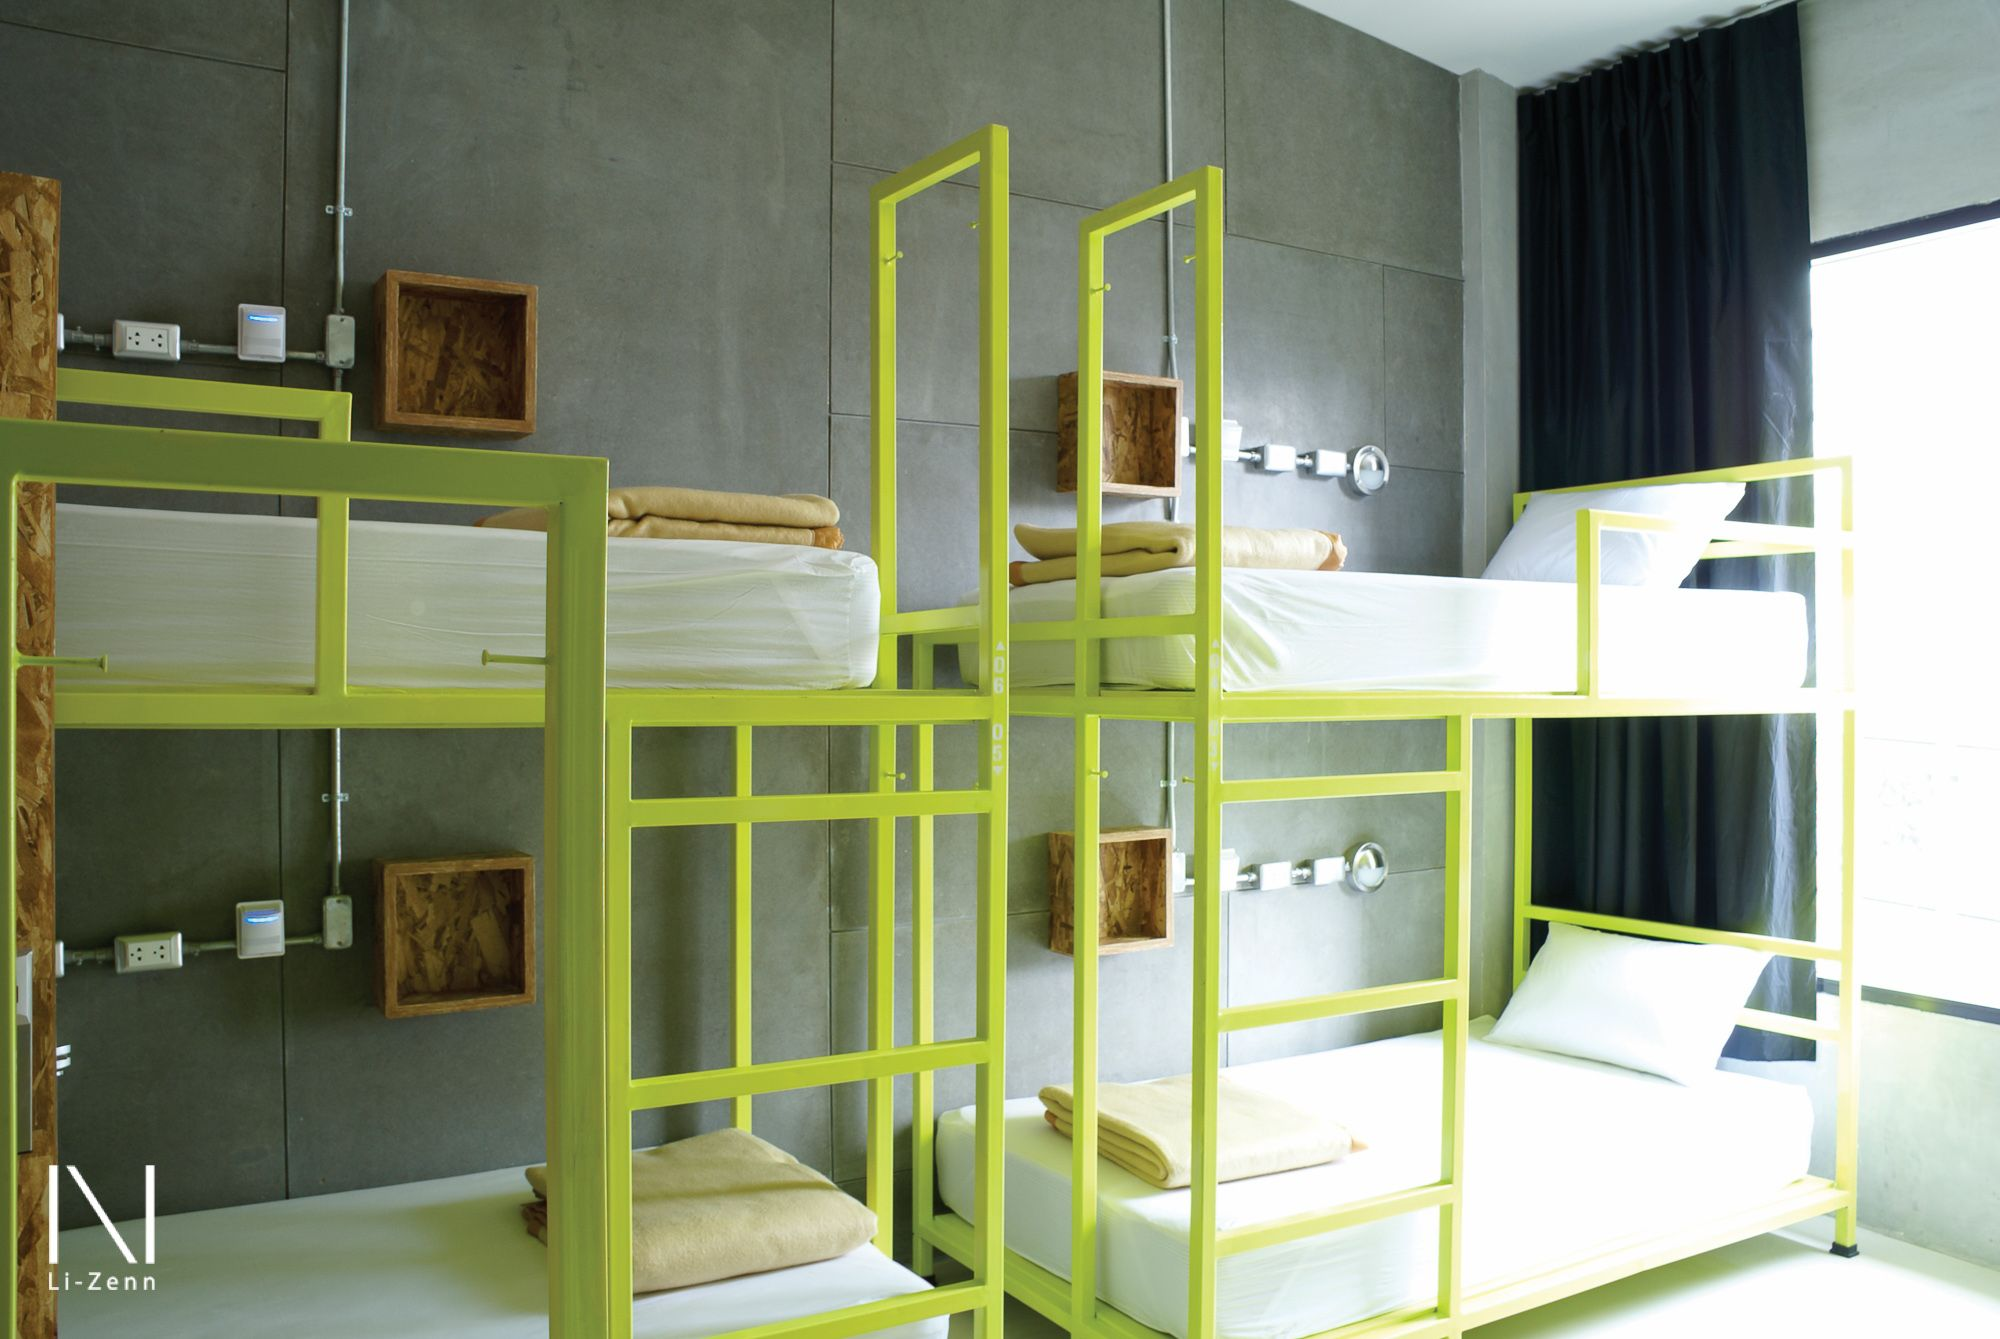 Lub Silom - Google Ms Yesinn Hotel Quartos